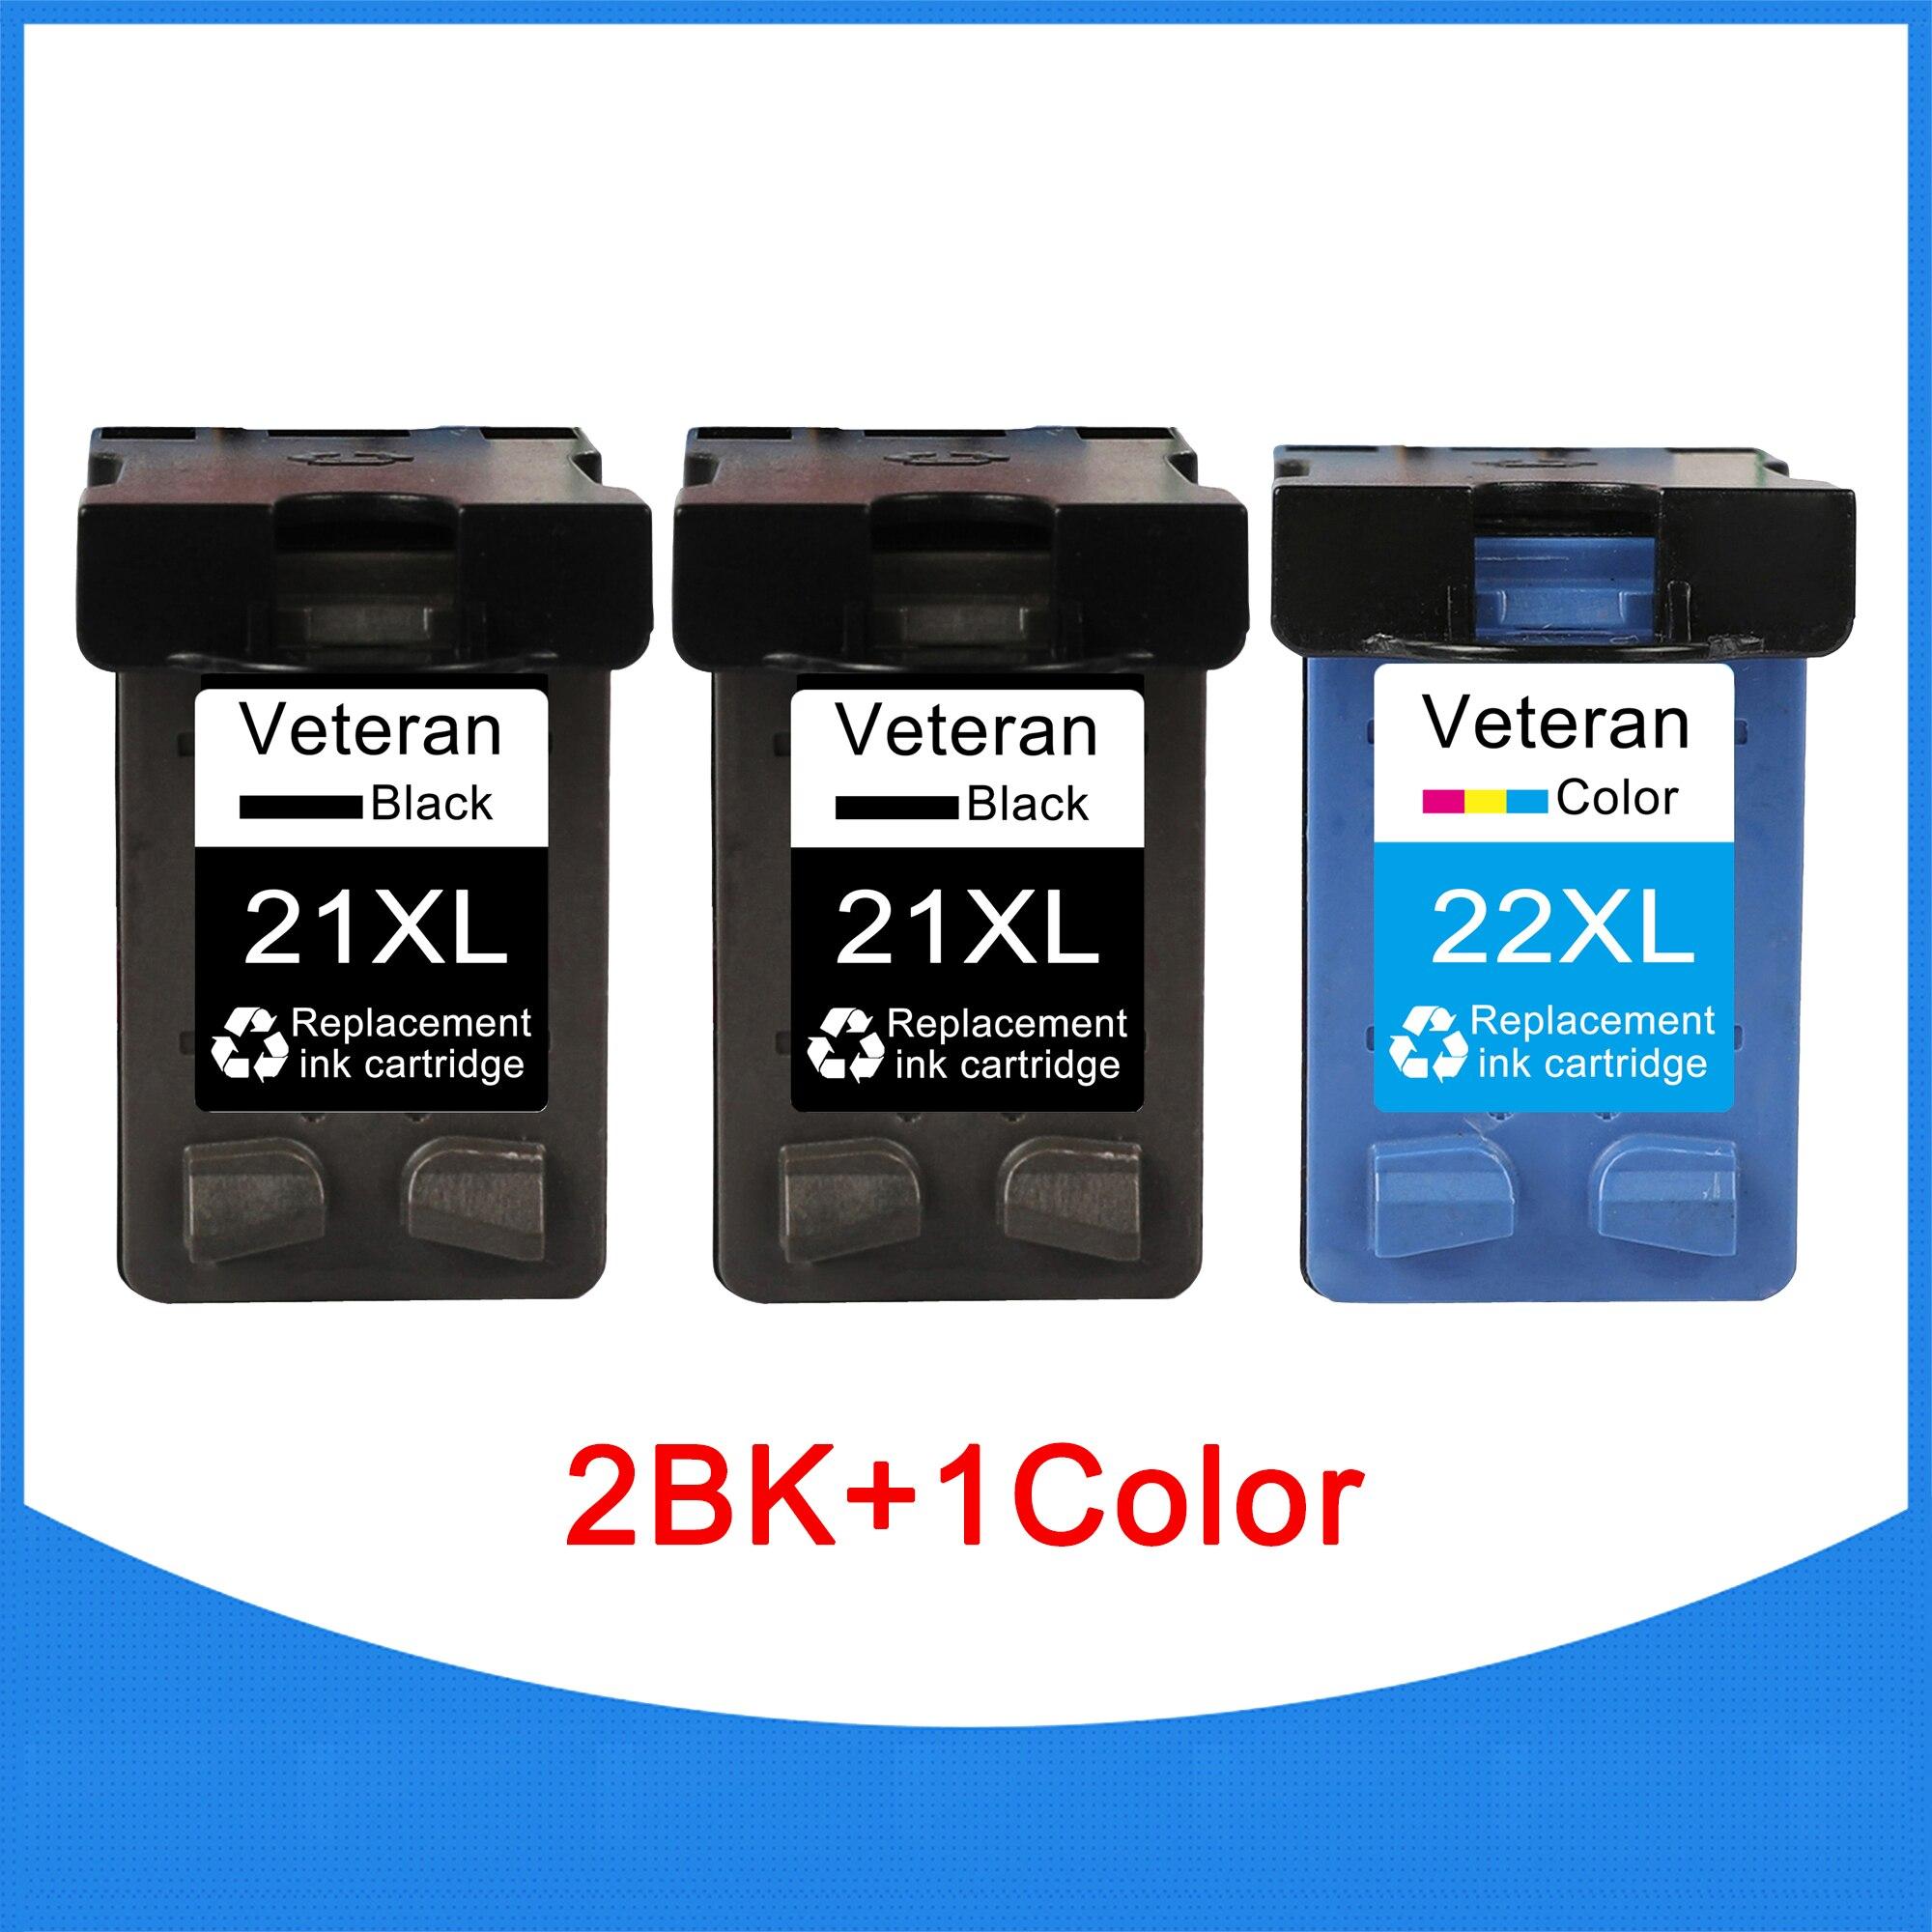 Картридж Veteran 21 22 для hp 21xl для hp21 hp22, чернильный картридж для принтера Deskjet F2180 F4180 F2200 F2280 F300 F380 380 D2300